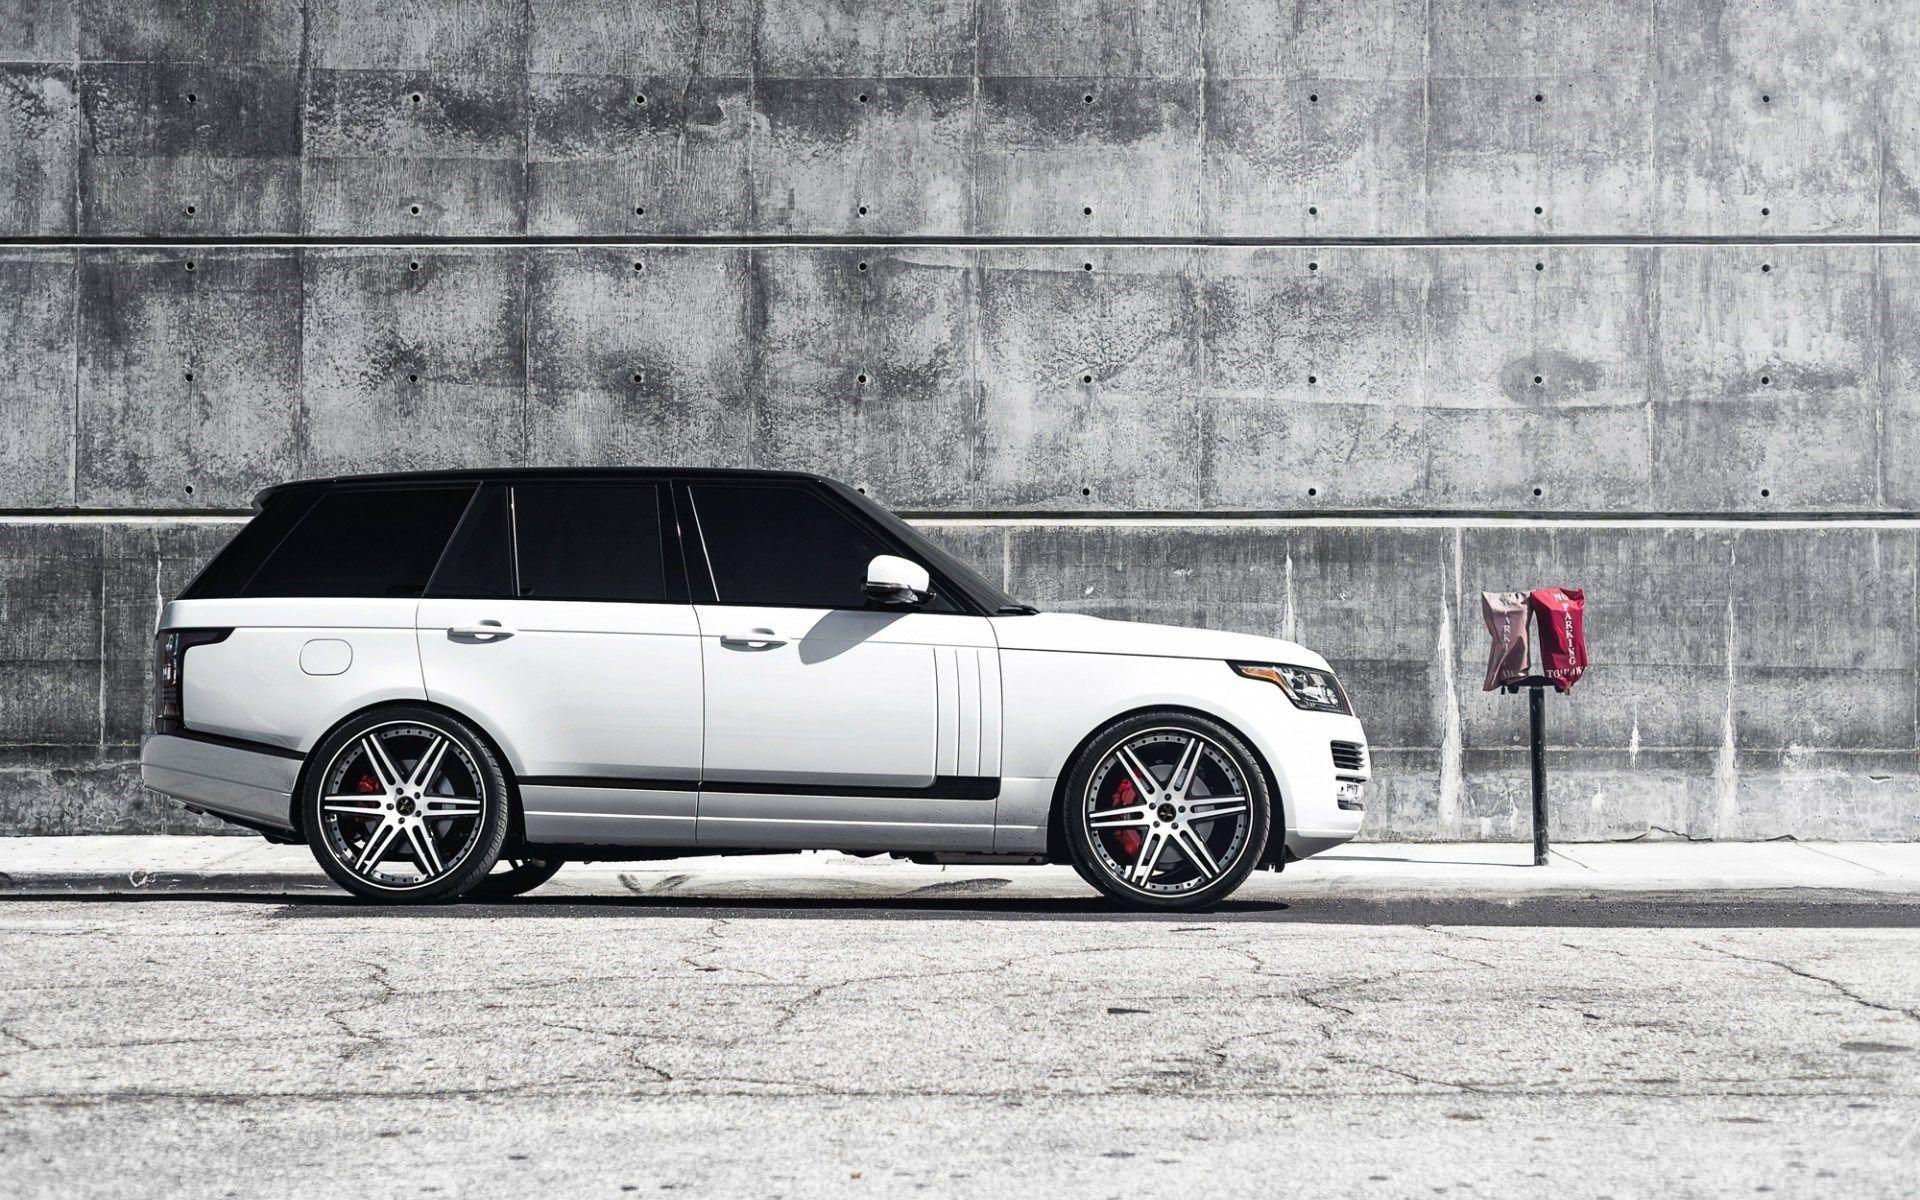 Range Rover Wallpaper Hd: Range Rover Wallpapers